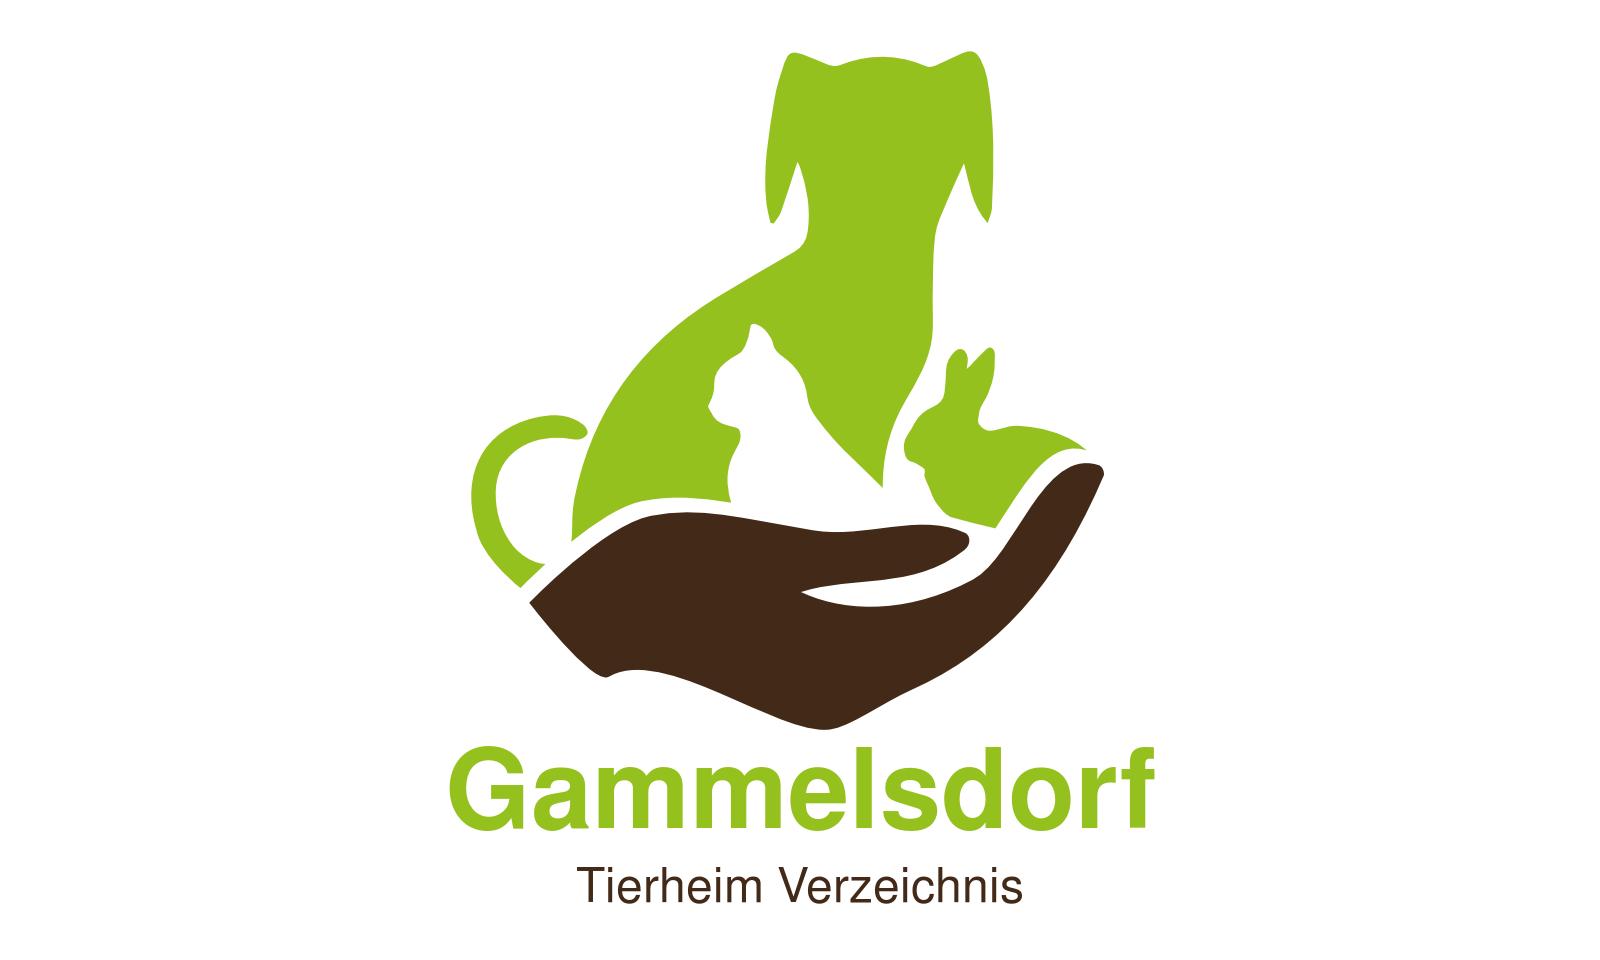 Tierheim Gammelsdorf